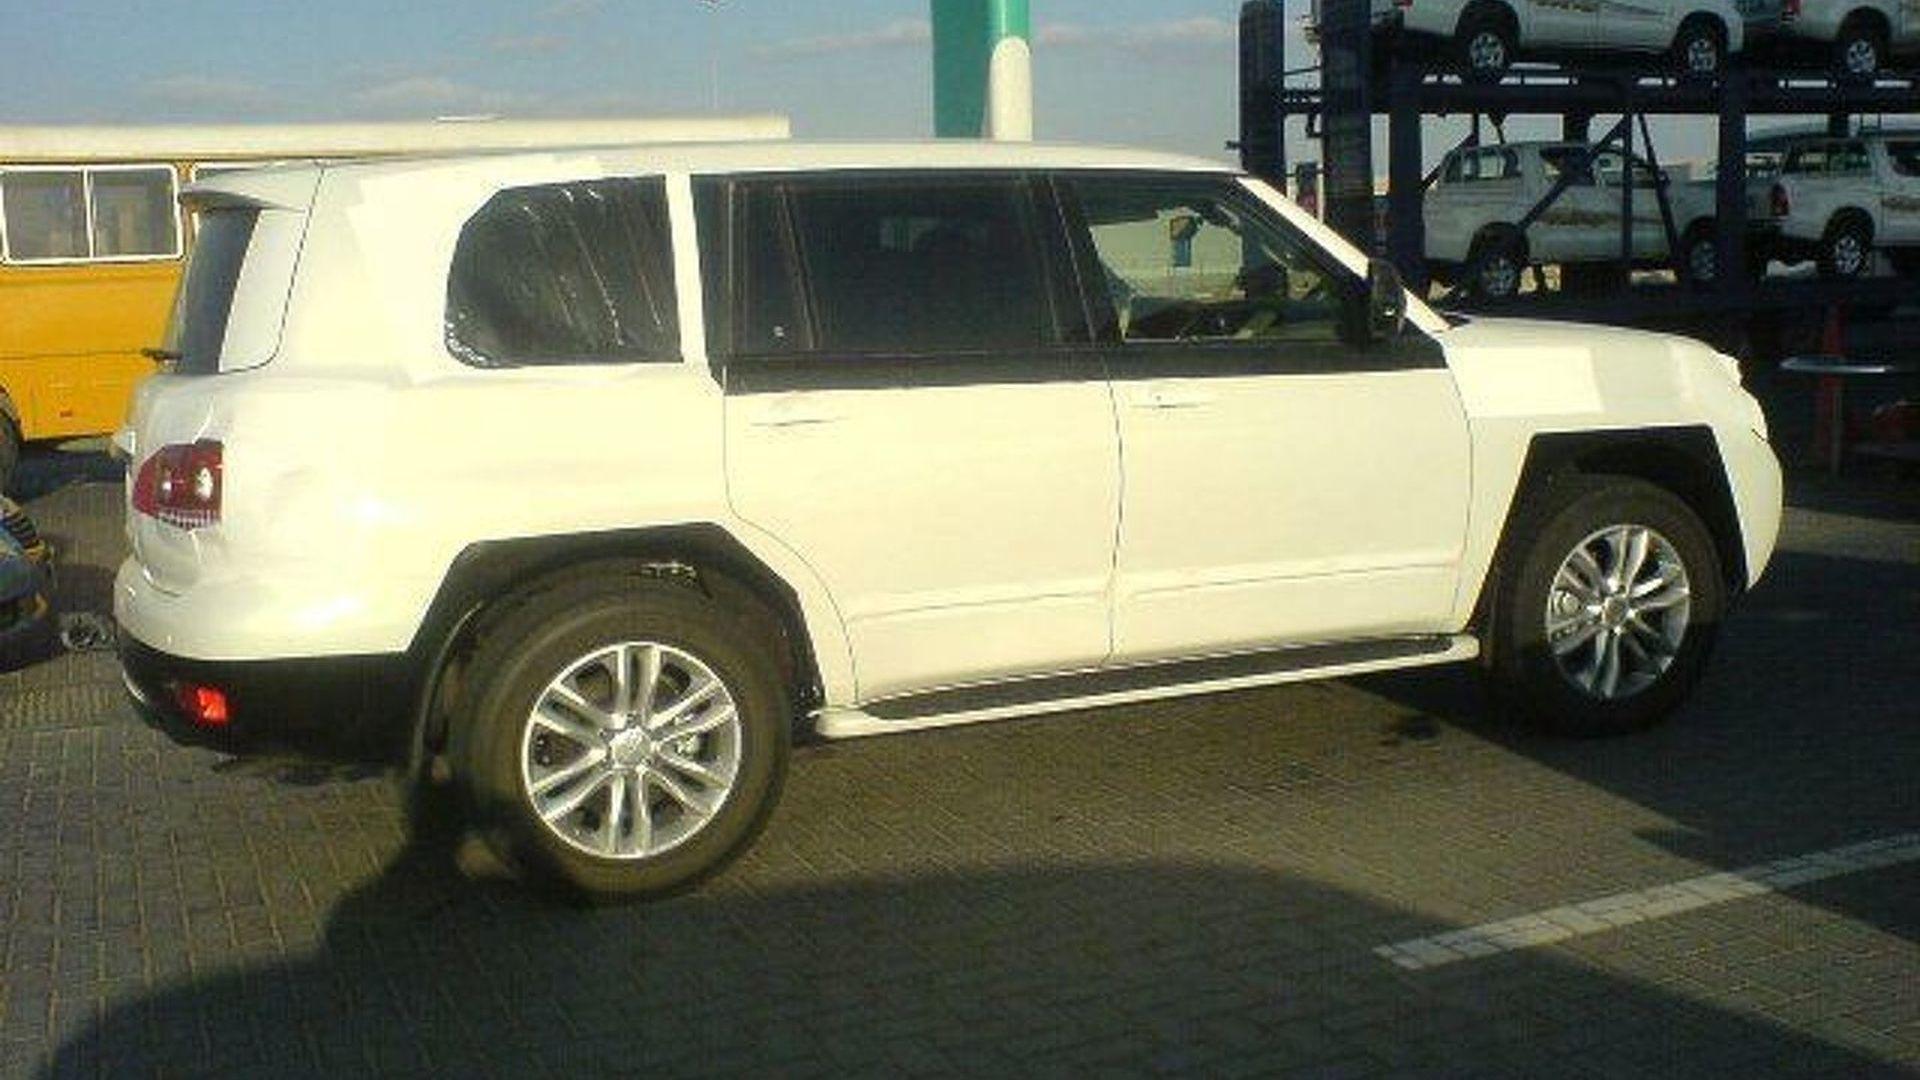 All New 2010 Nissan Patrol / Safari Interior Spy Photos in ...